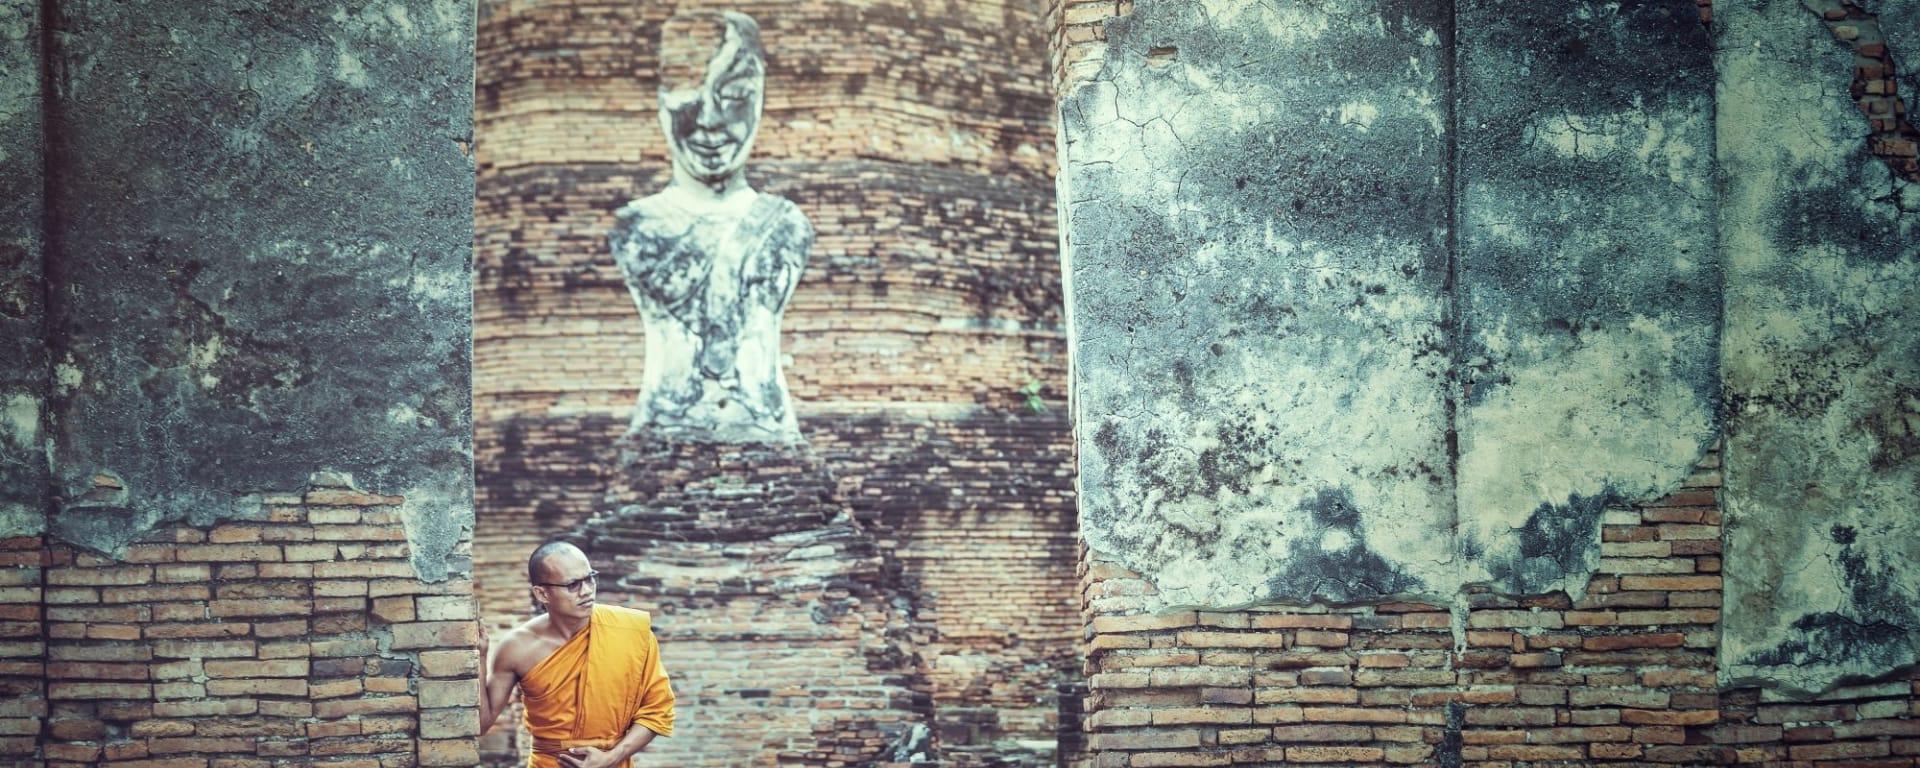 Les hauts lieux de la Thaïlande de Bangkok: Ayutthaya Historial Park with Monk